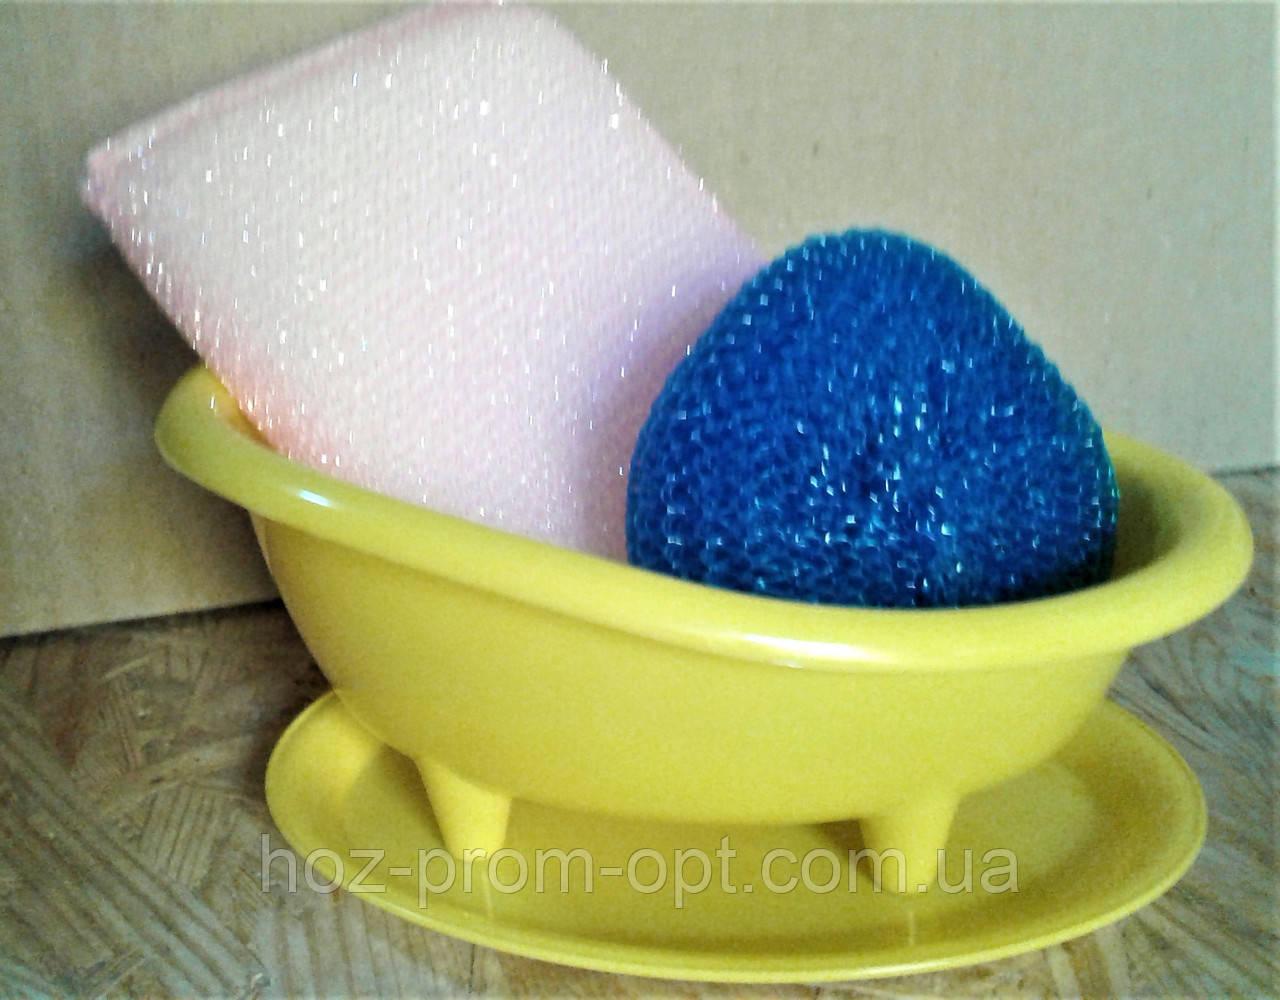 Ванночка (подставка) для губок пластиковая.